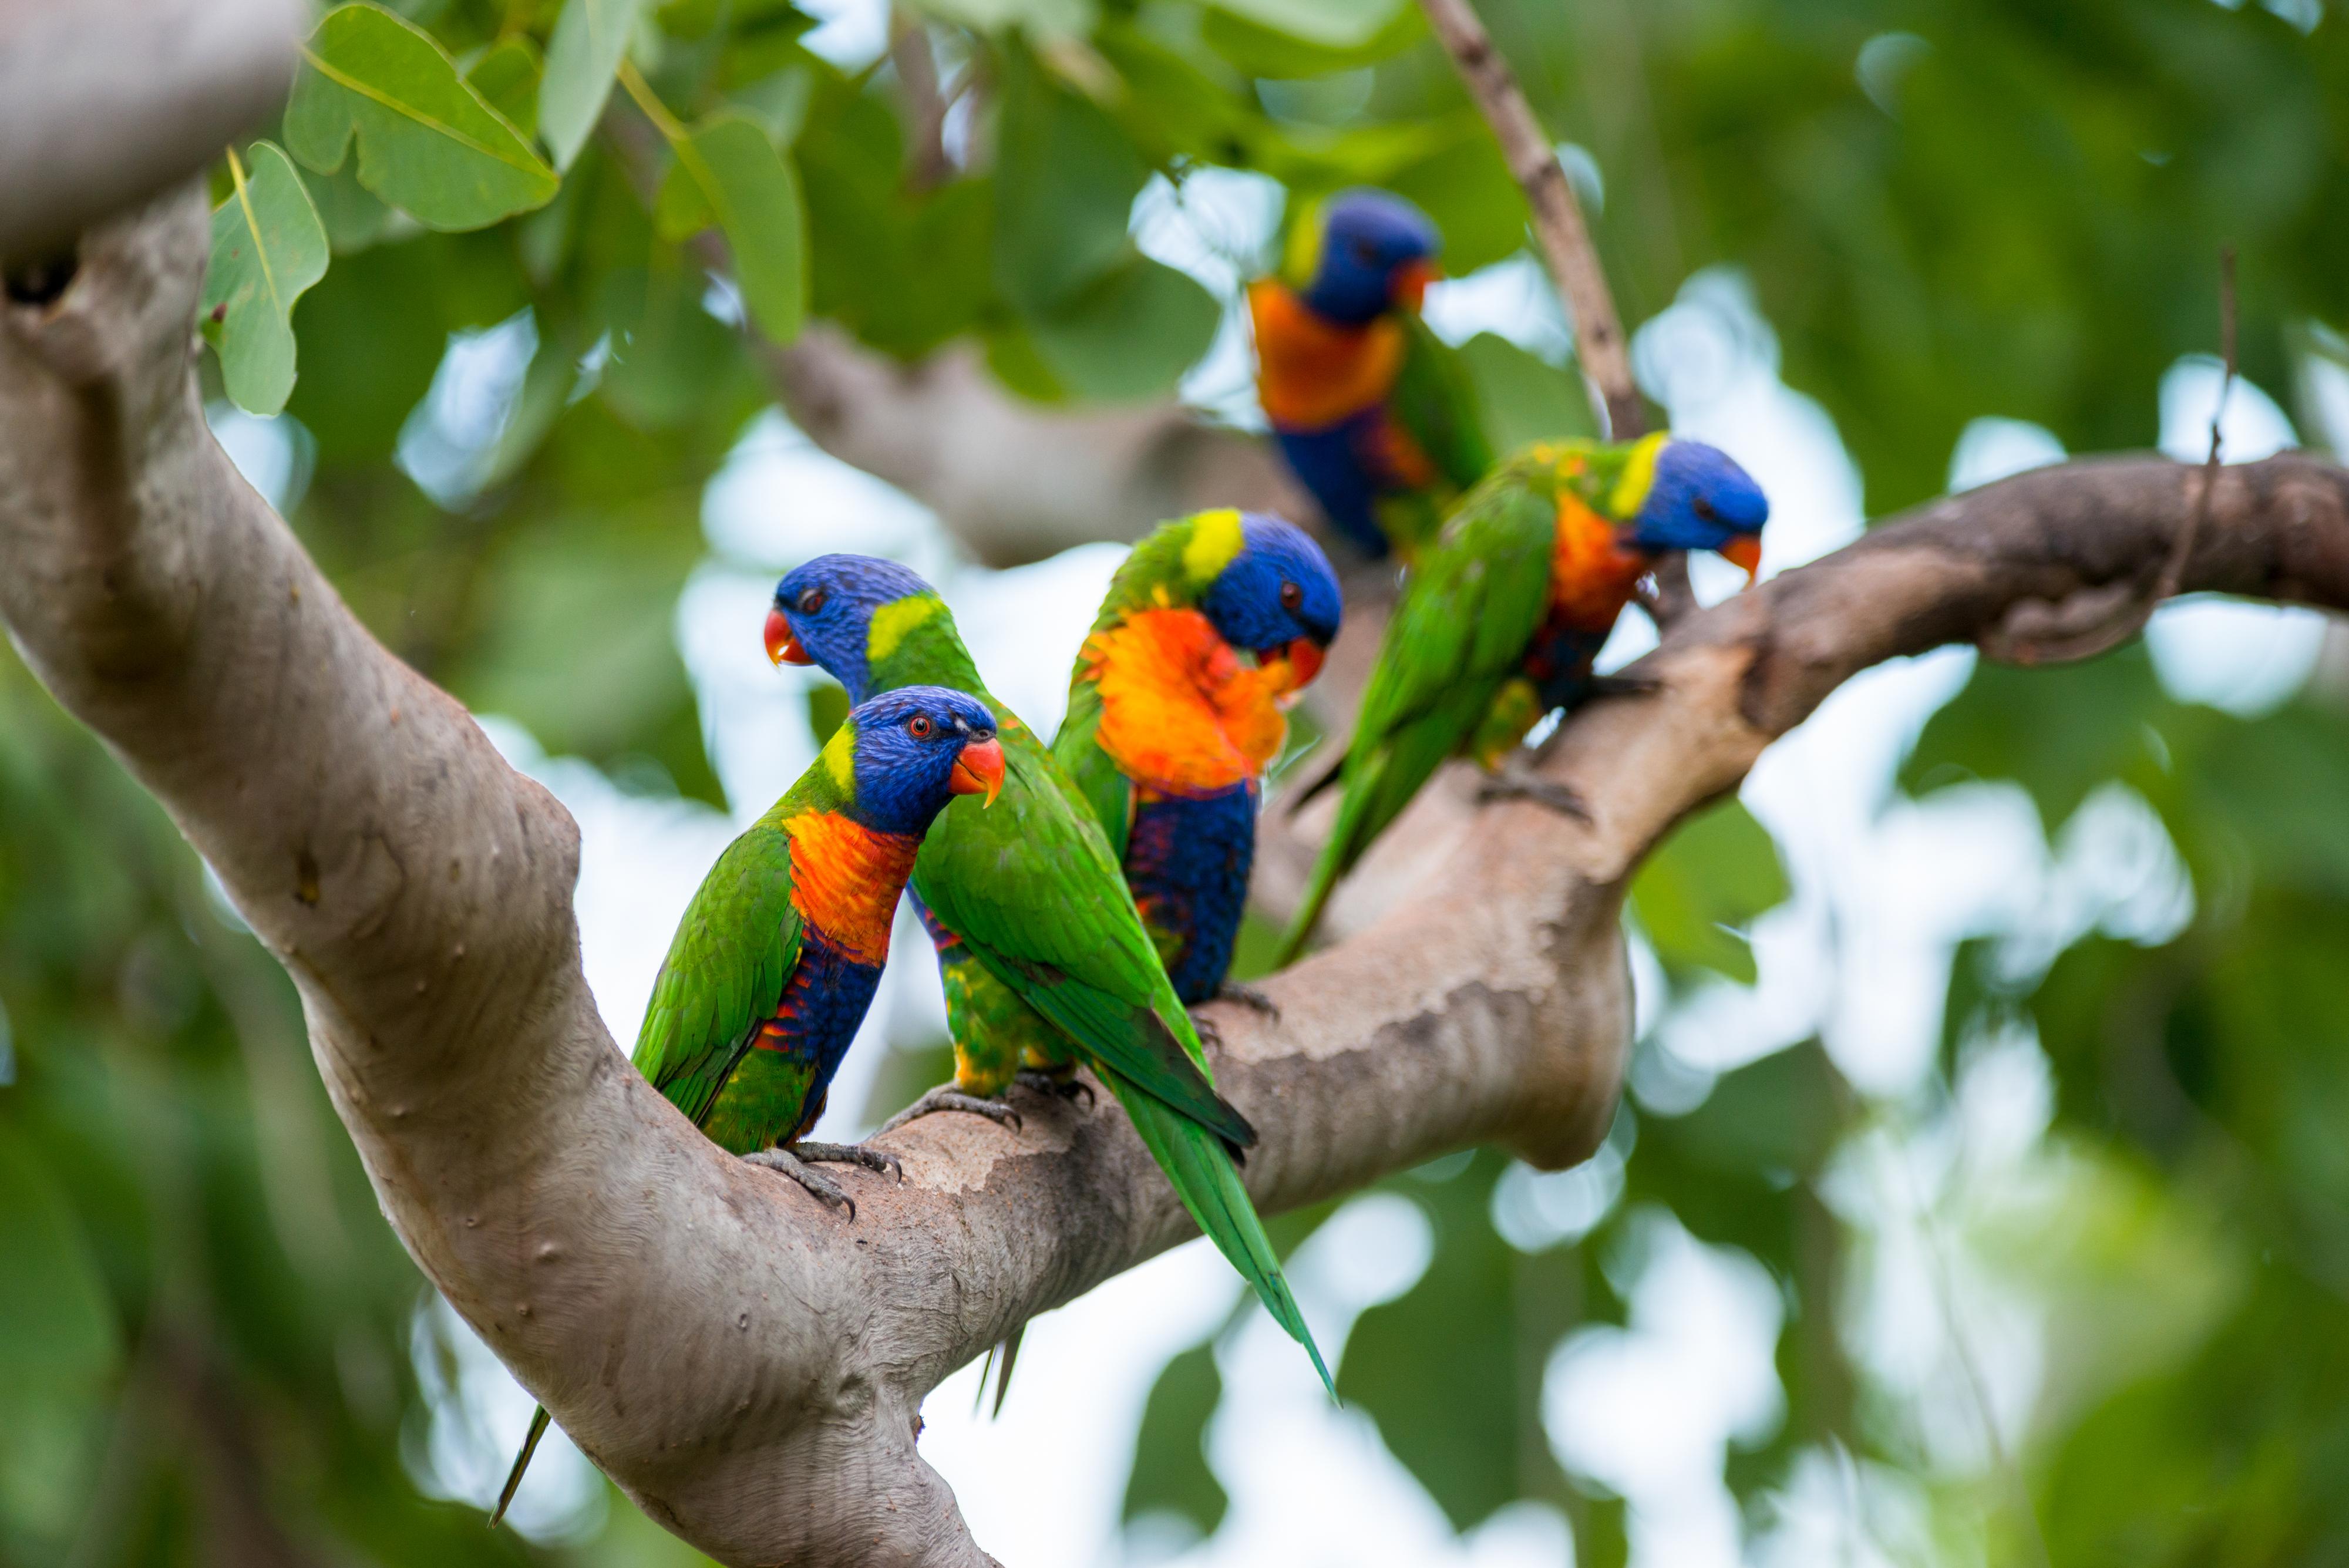 http://www.thalabeach.com.au/wp-content/uploads/2010/07/Thala_Beach_Nature_Reserve_2016__25.jpg